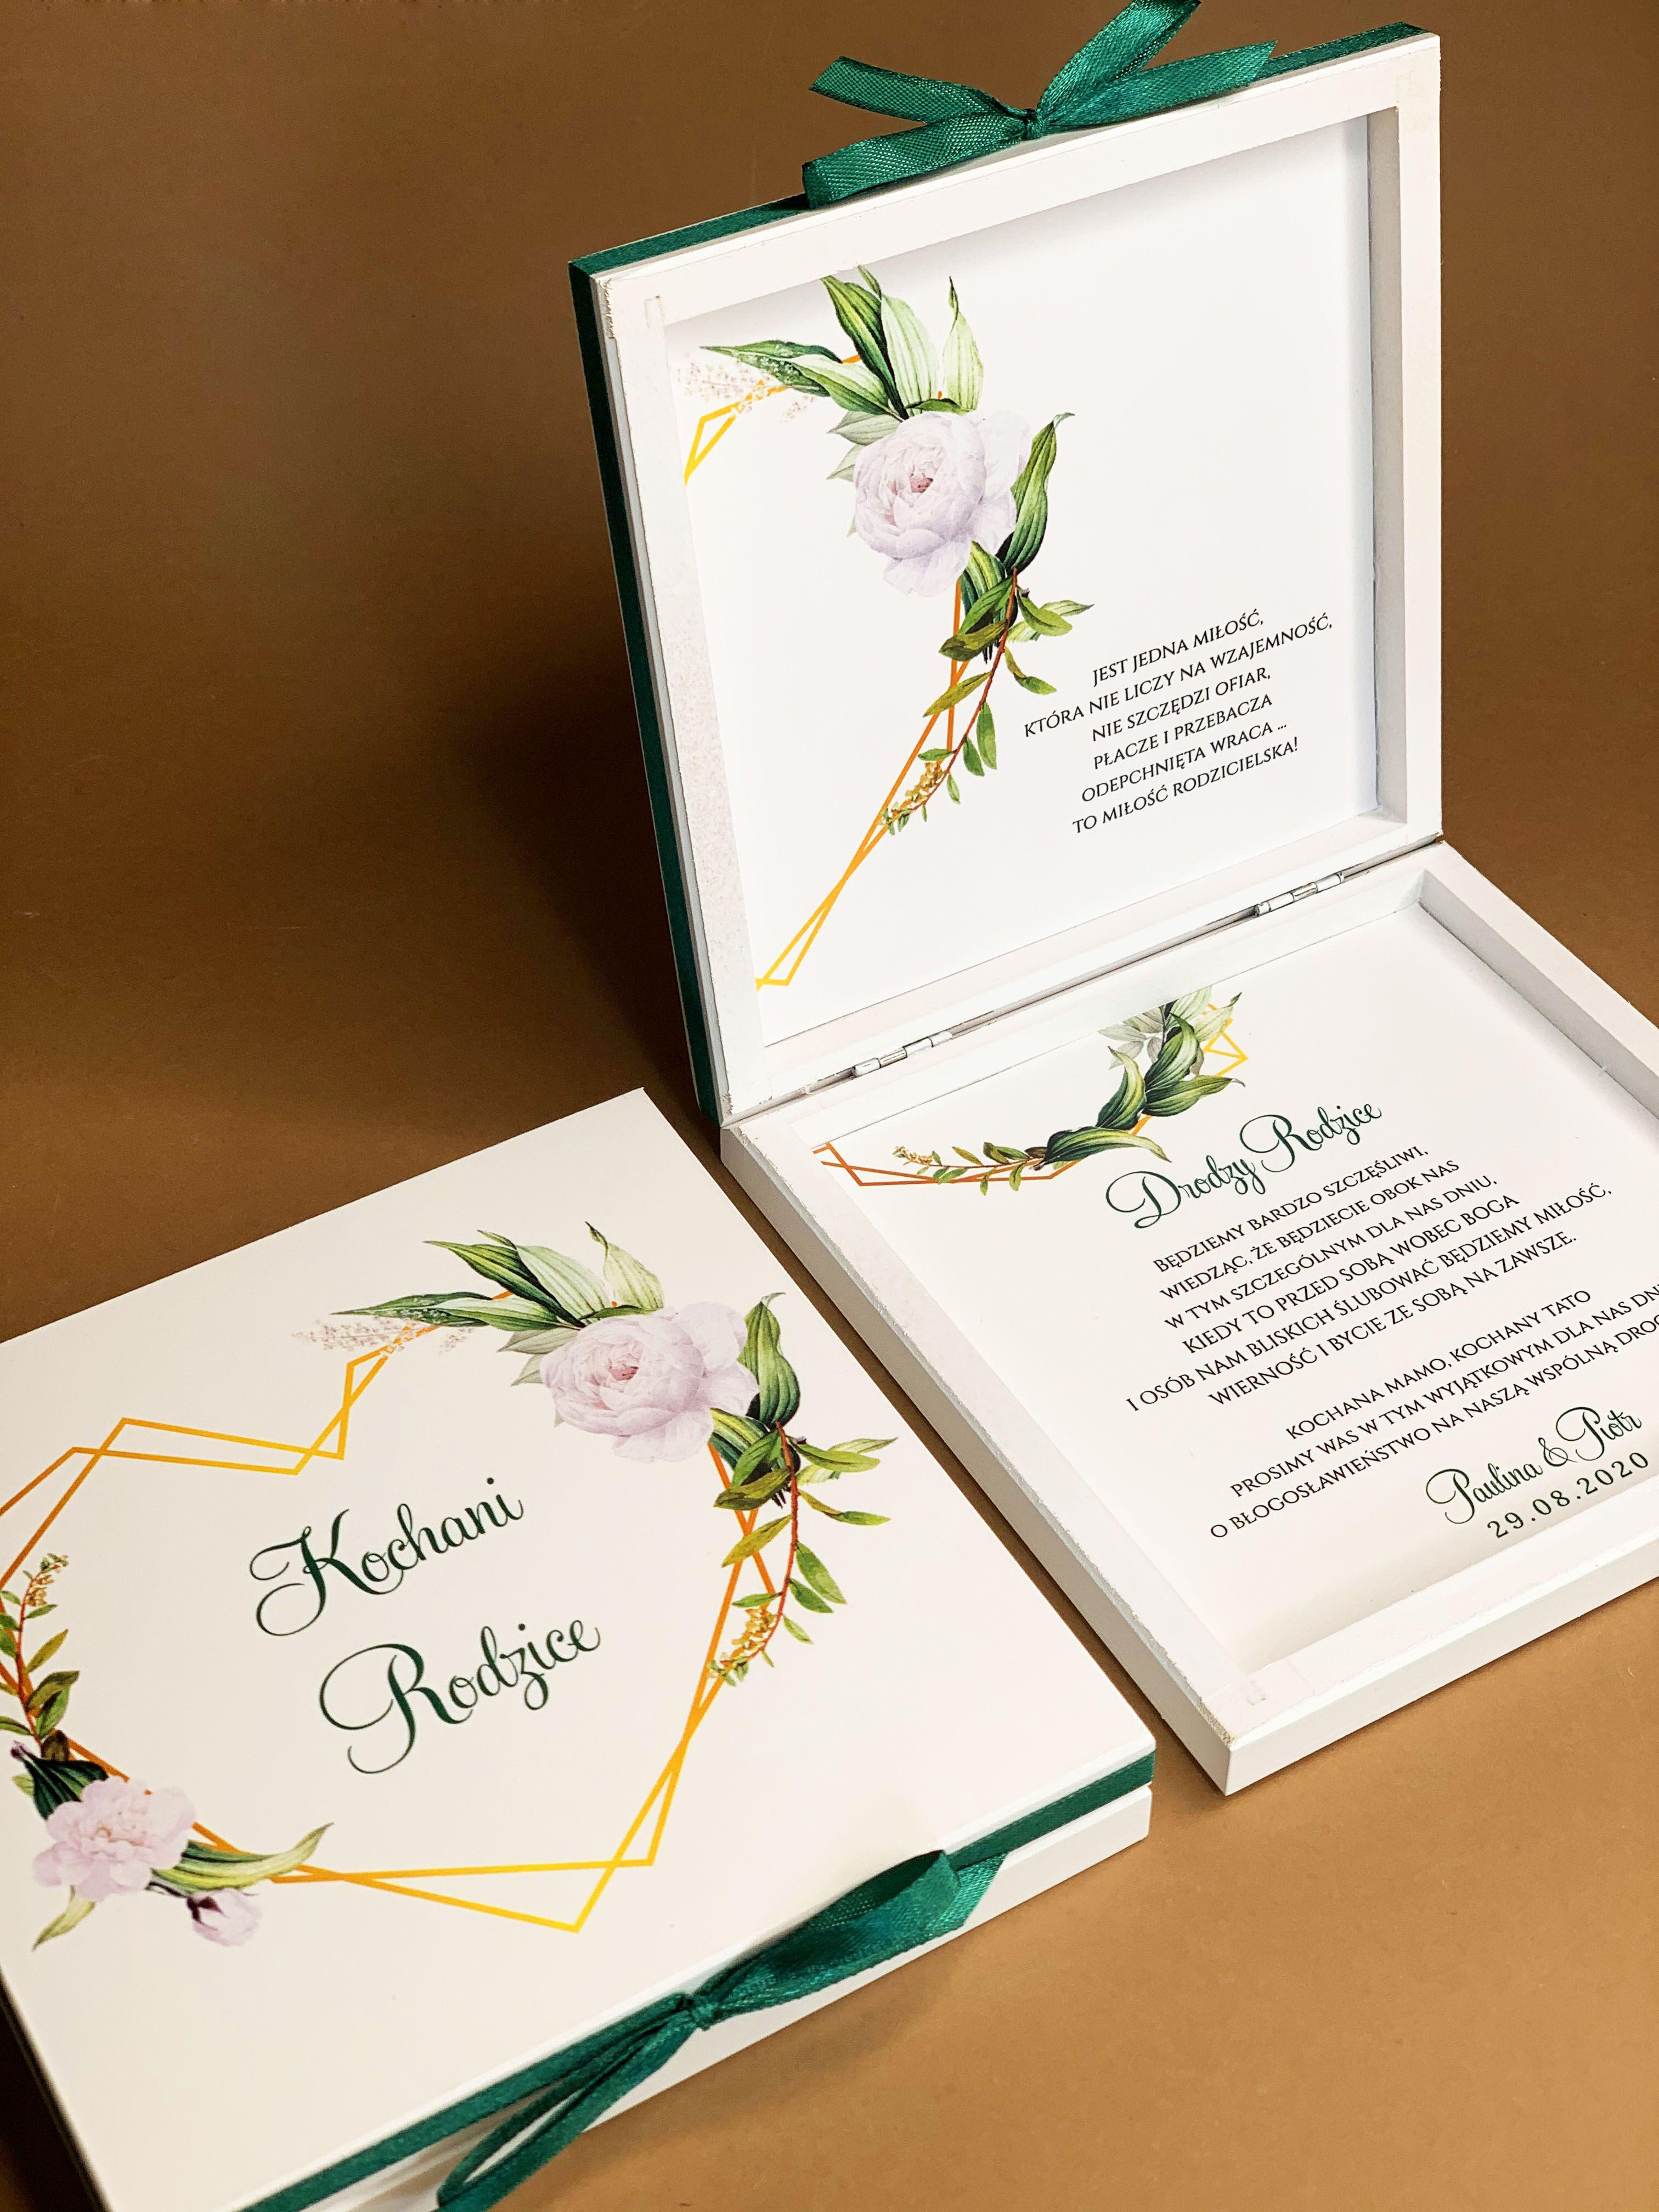 Zaproszenie Slubne Butelkowa Zielen Biale Kwiaty Serce Zlote Geometryczne Zaproszenia Weselne Greenery Panna Mloda Wes Wedding Facebook Sign Up Facebook Sign